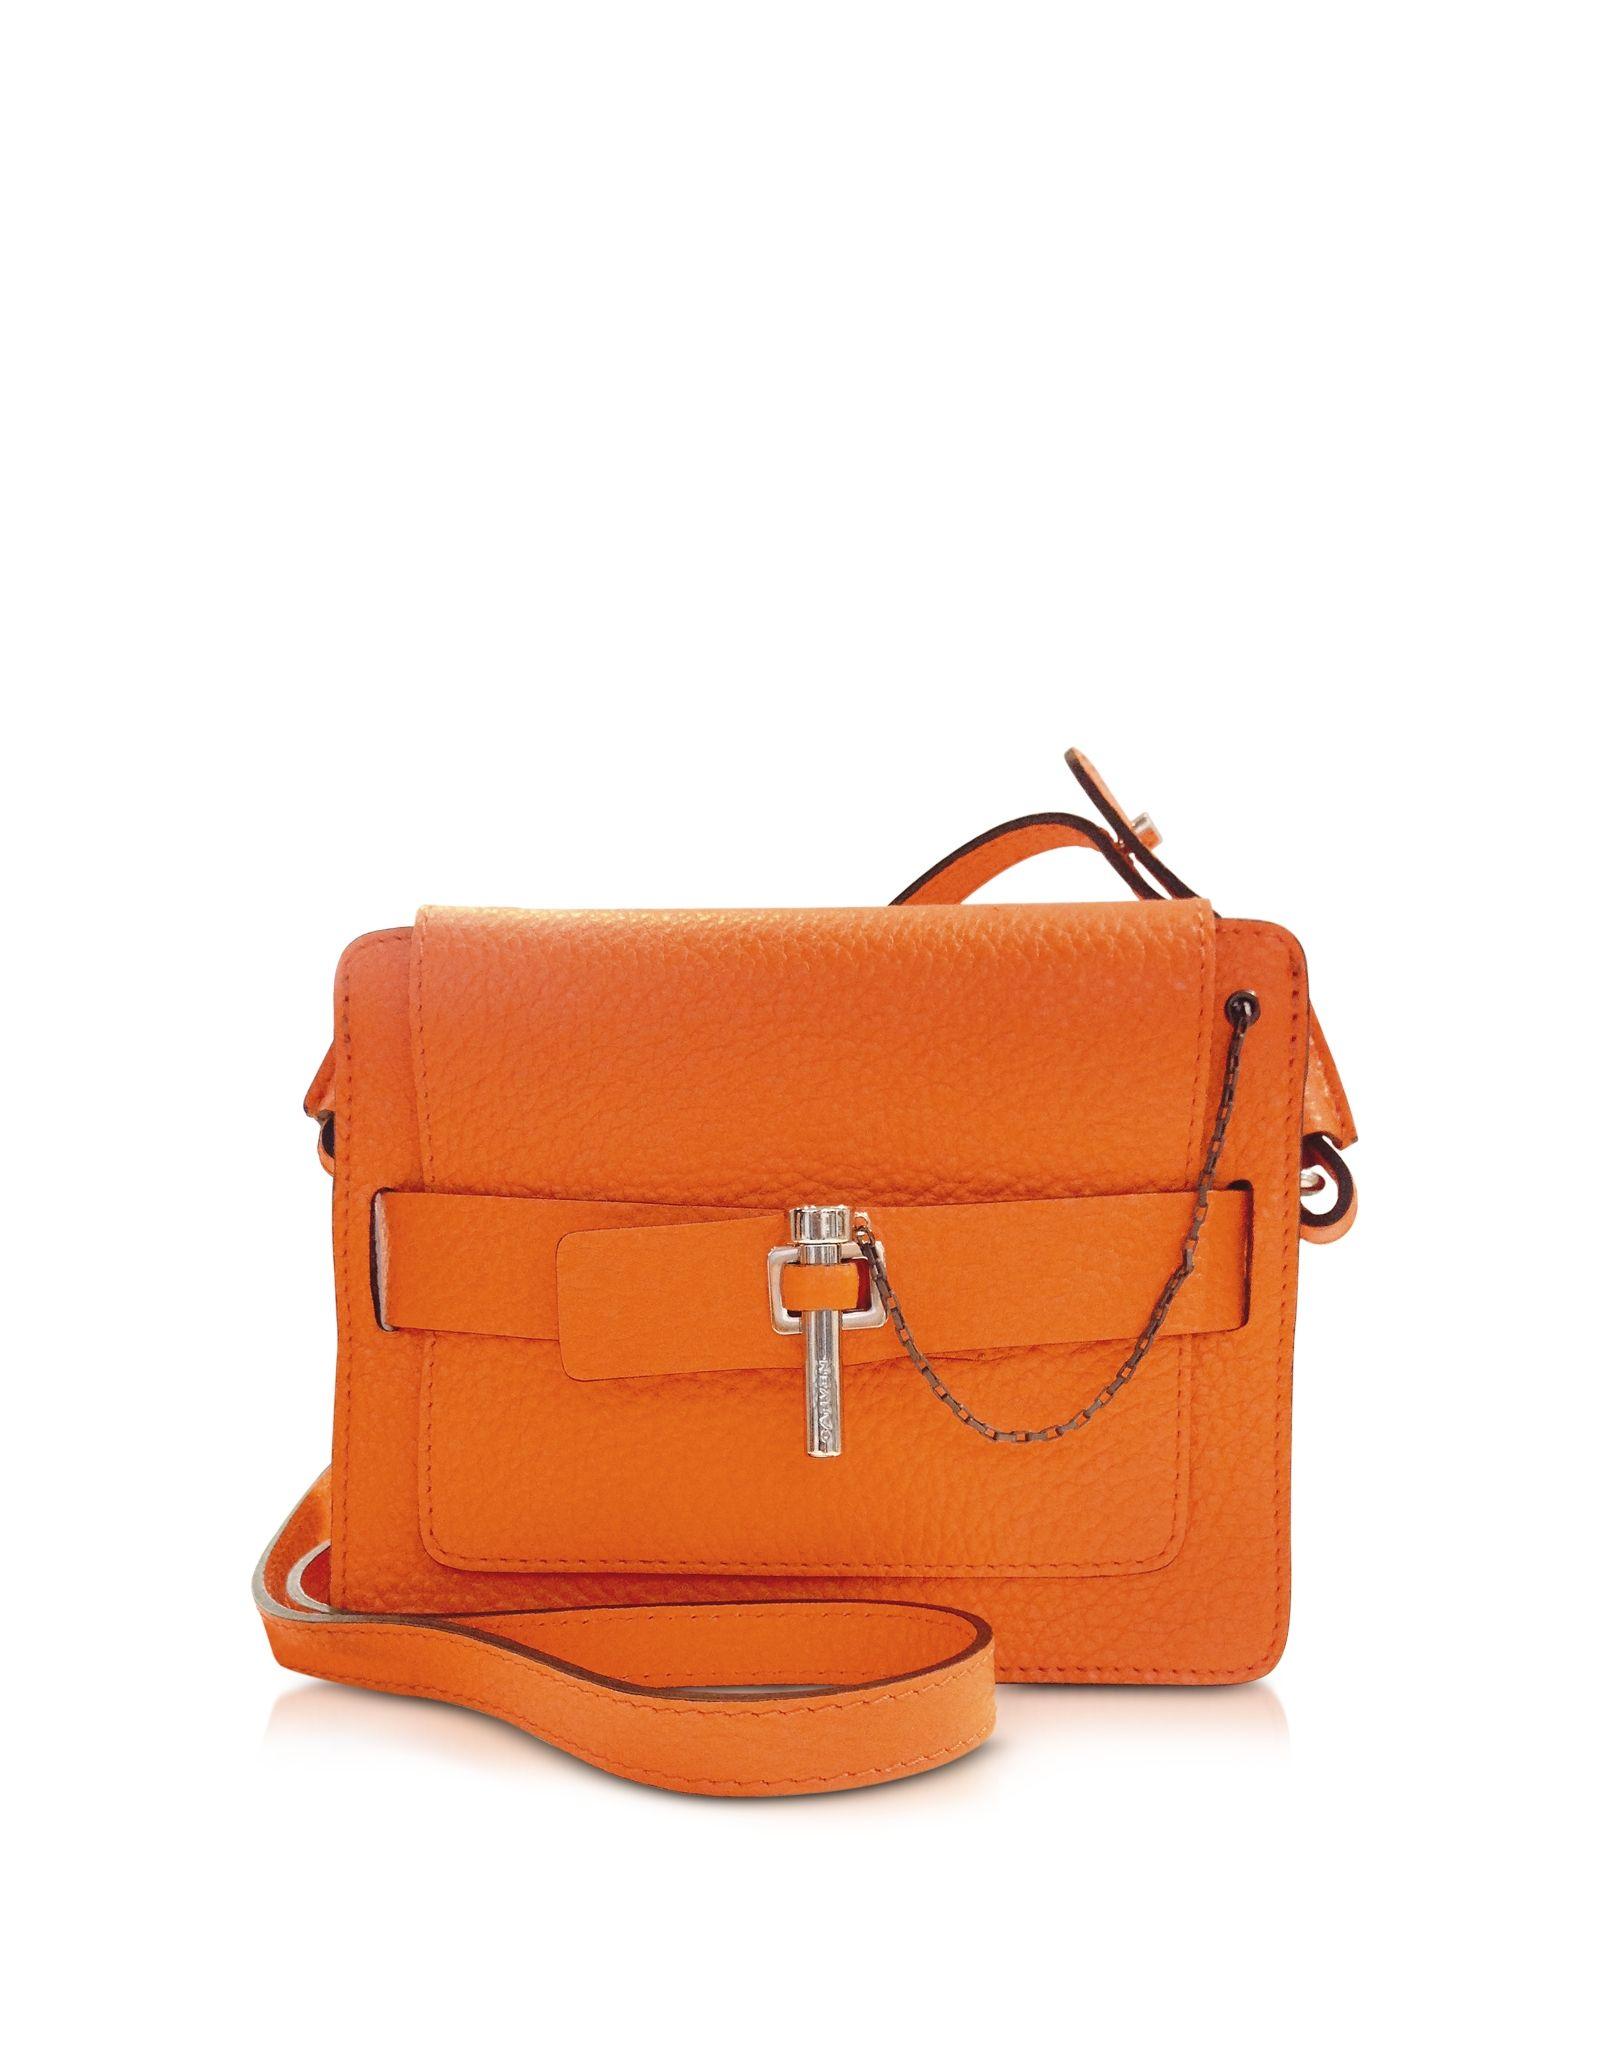 d029396e43 Carven Orange Small Mahler Bag at FORZIERI